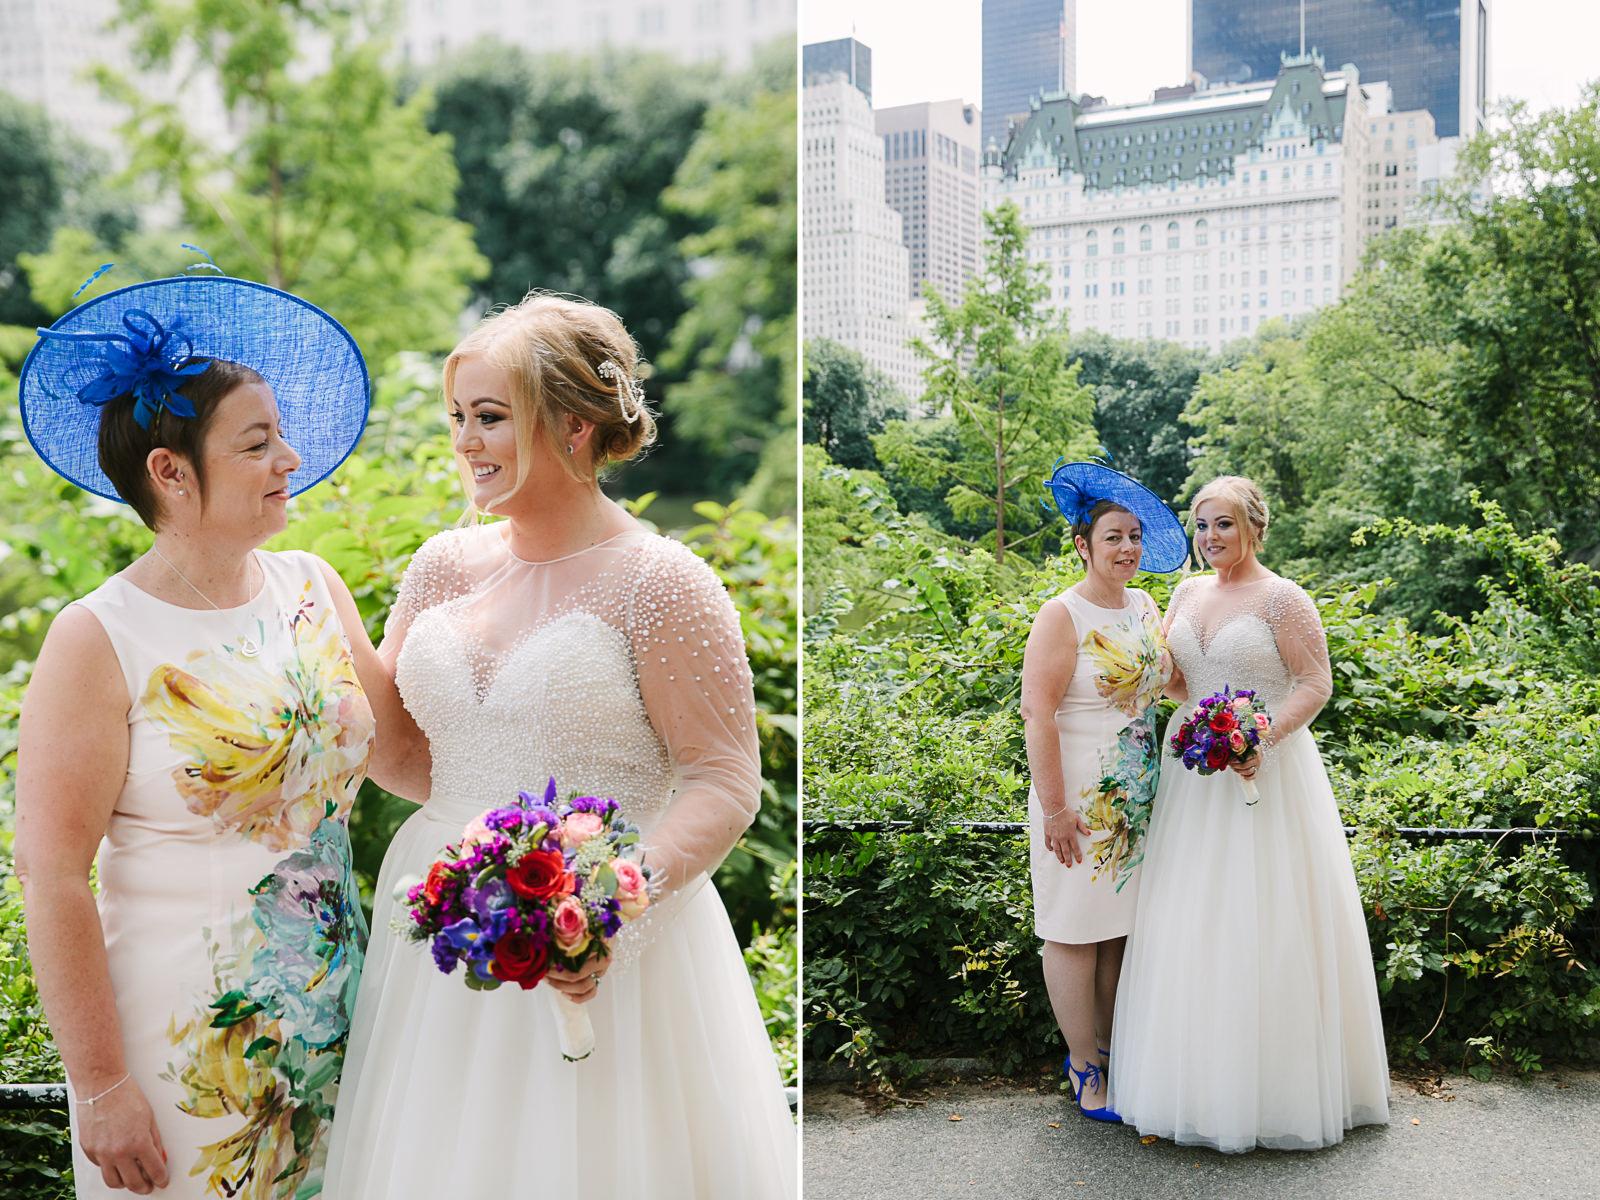 Gapstow-bridge-intimate-wedding-6.jpg